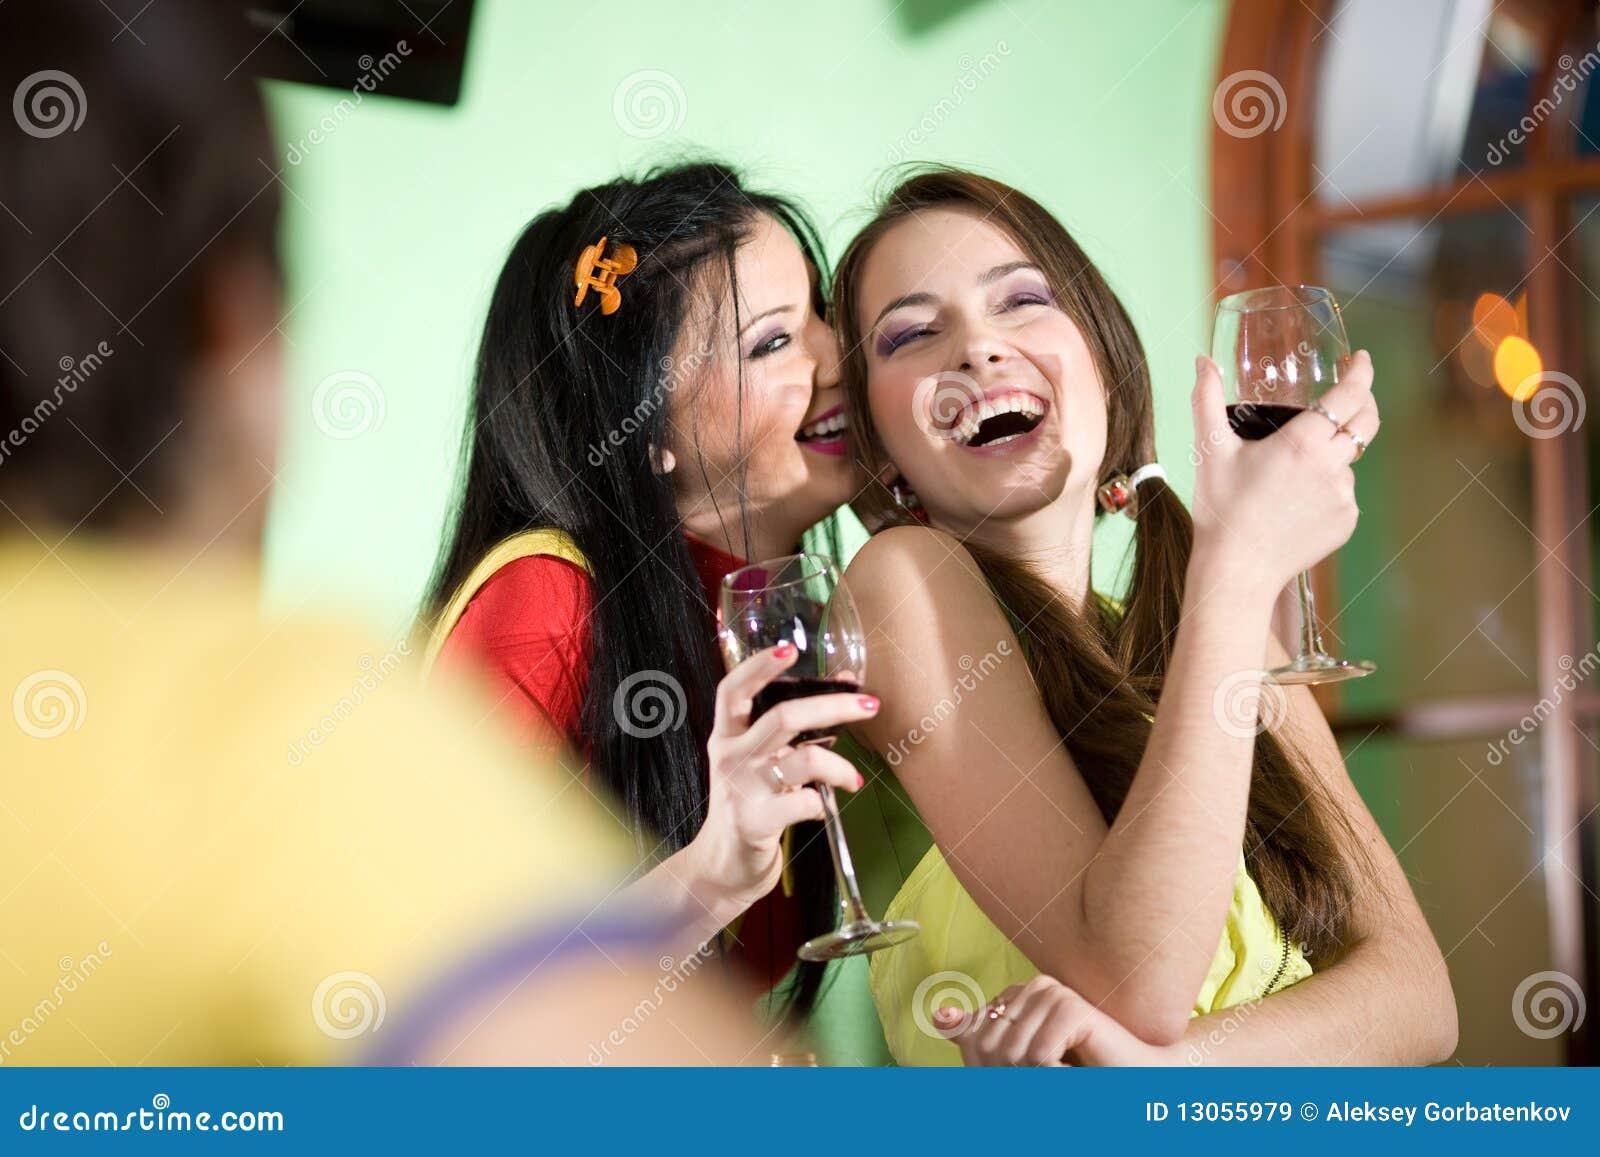 girl soaking boys wines a video